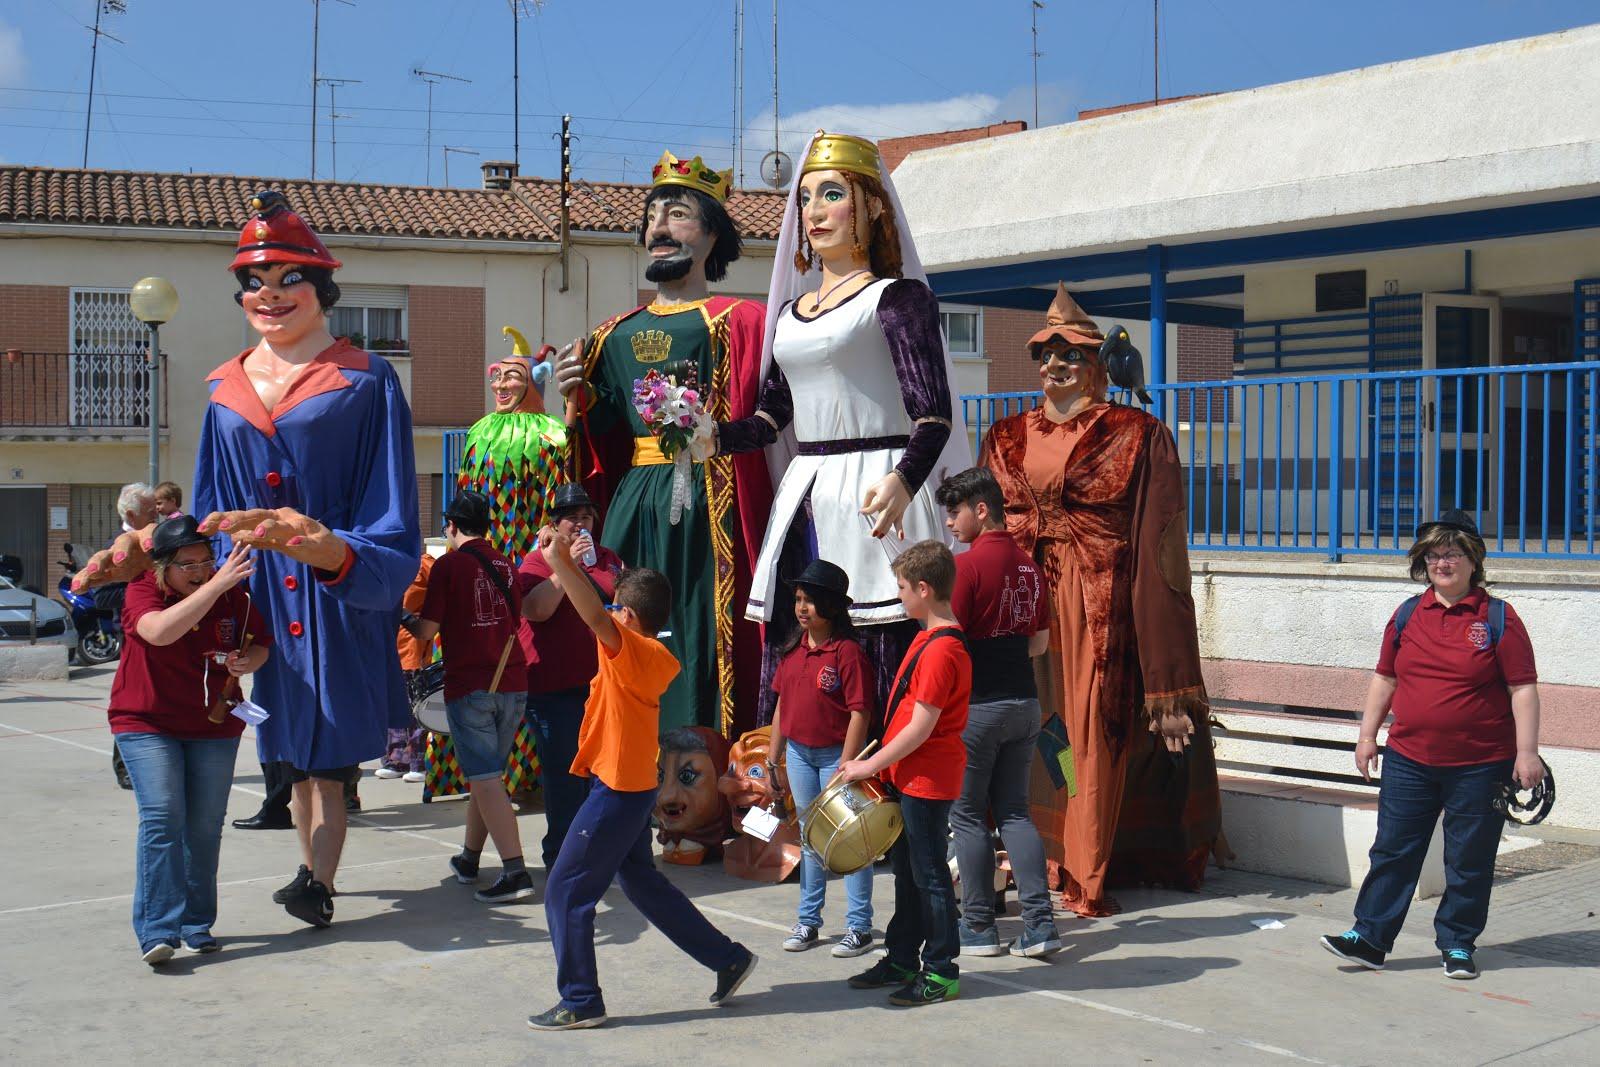 Festa Veïnal de Barris de Valls